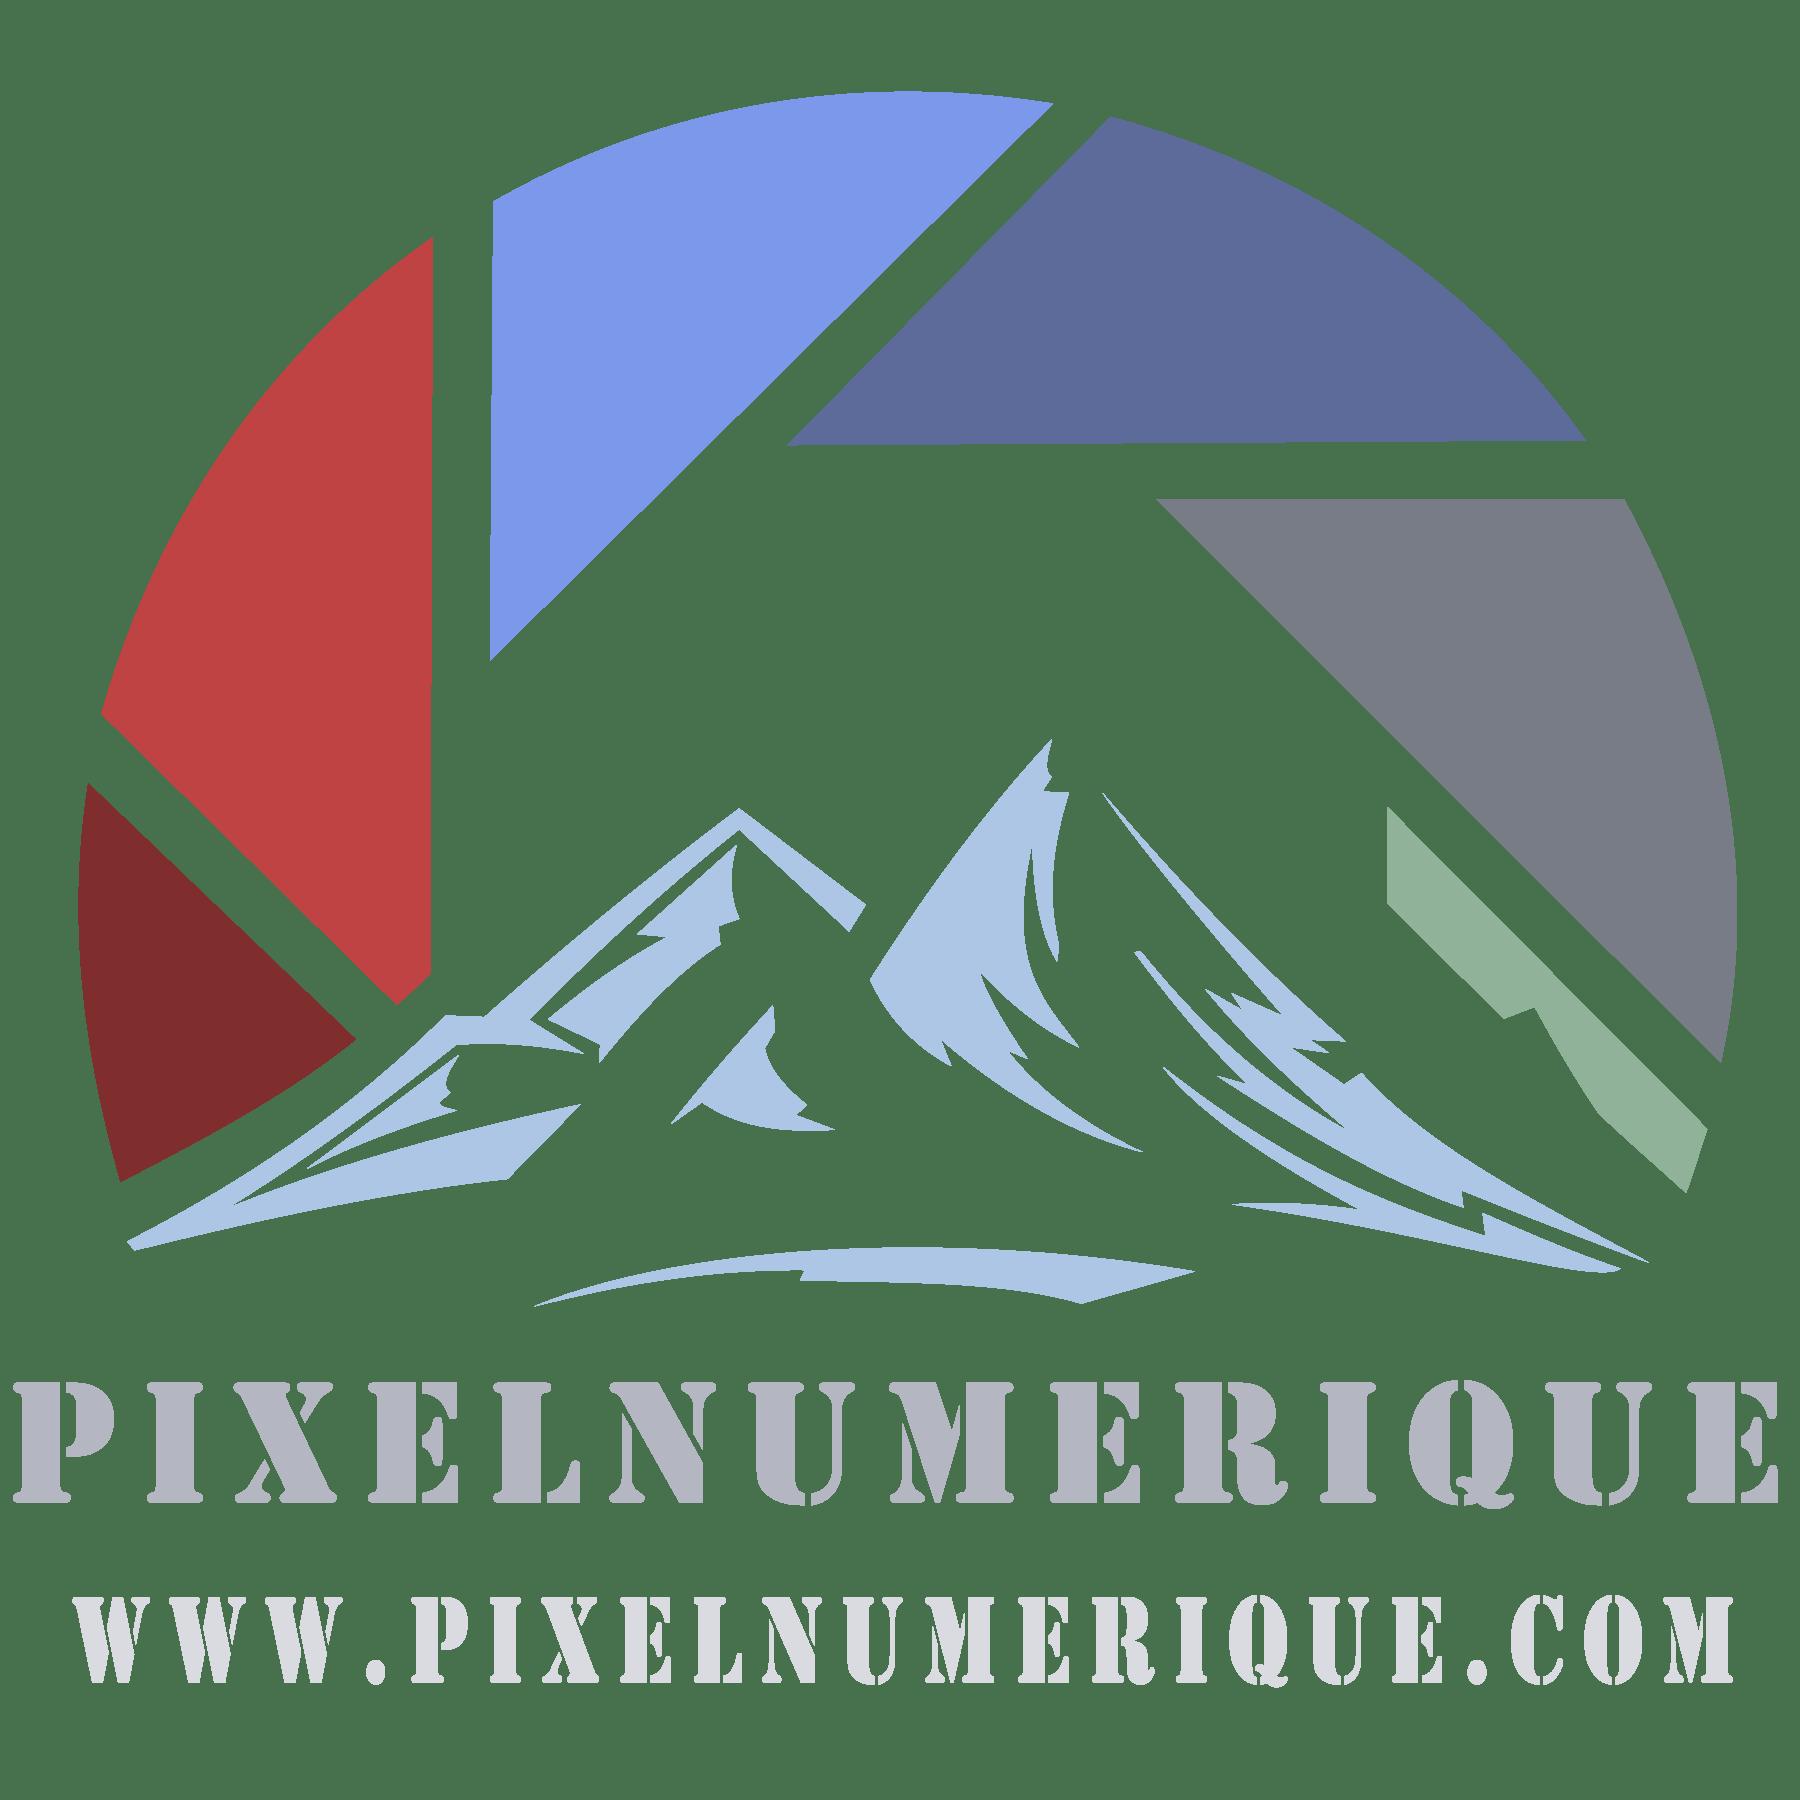 Pixelnumerique 2012